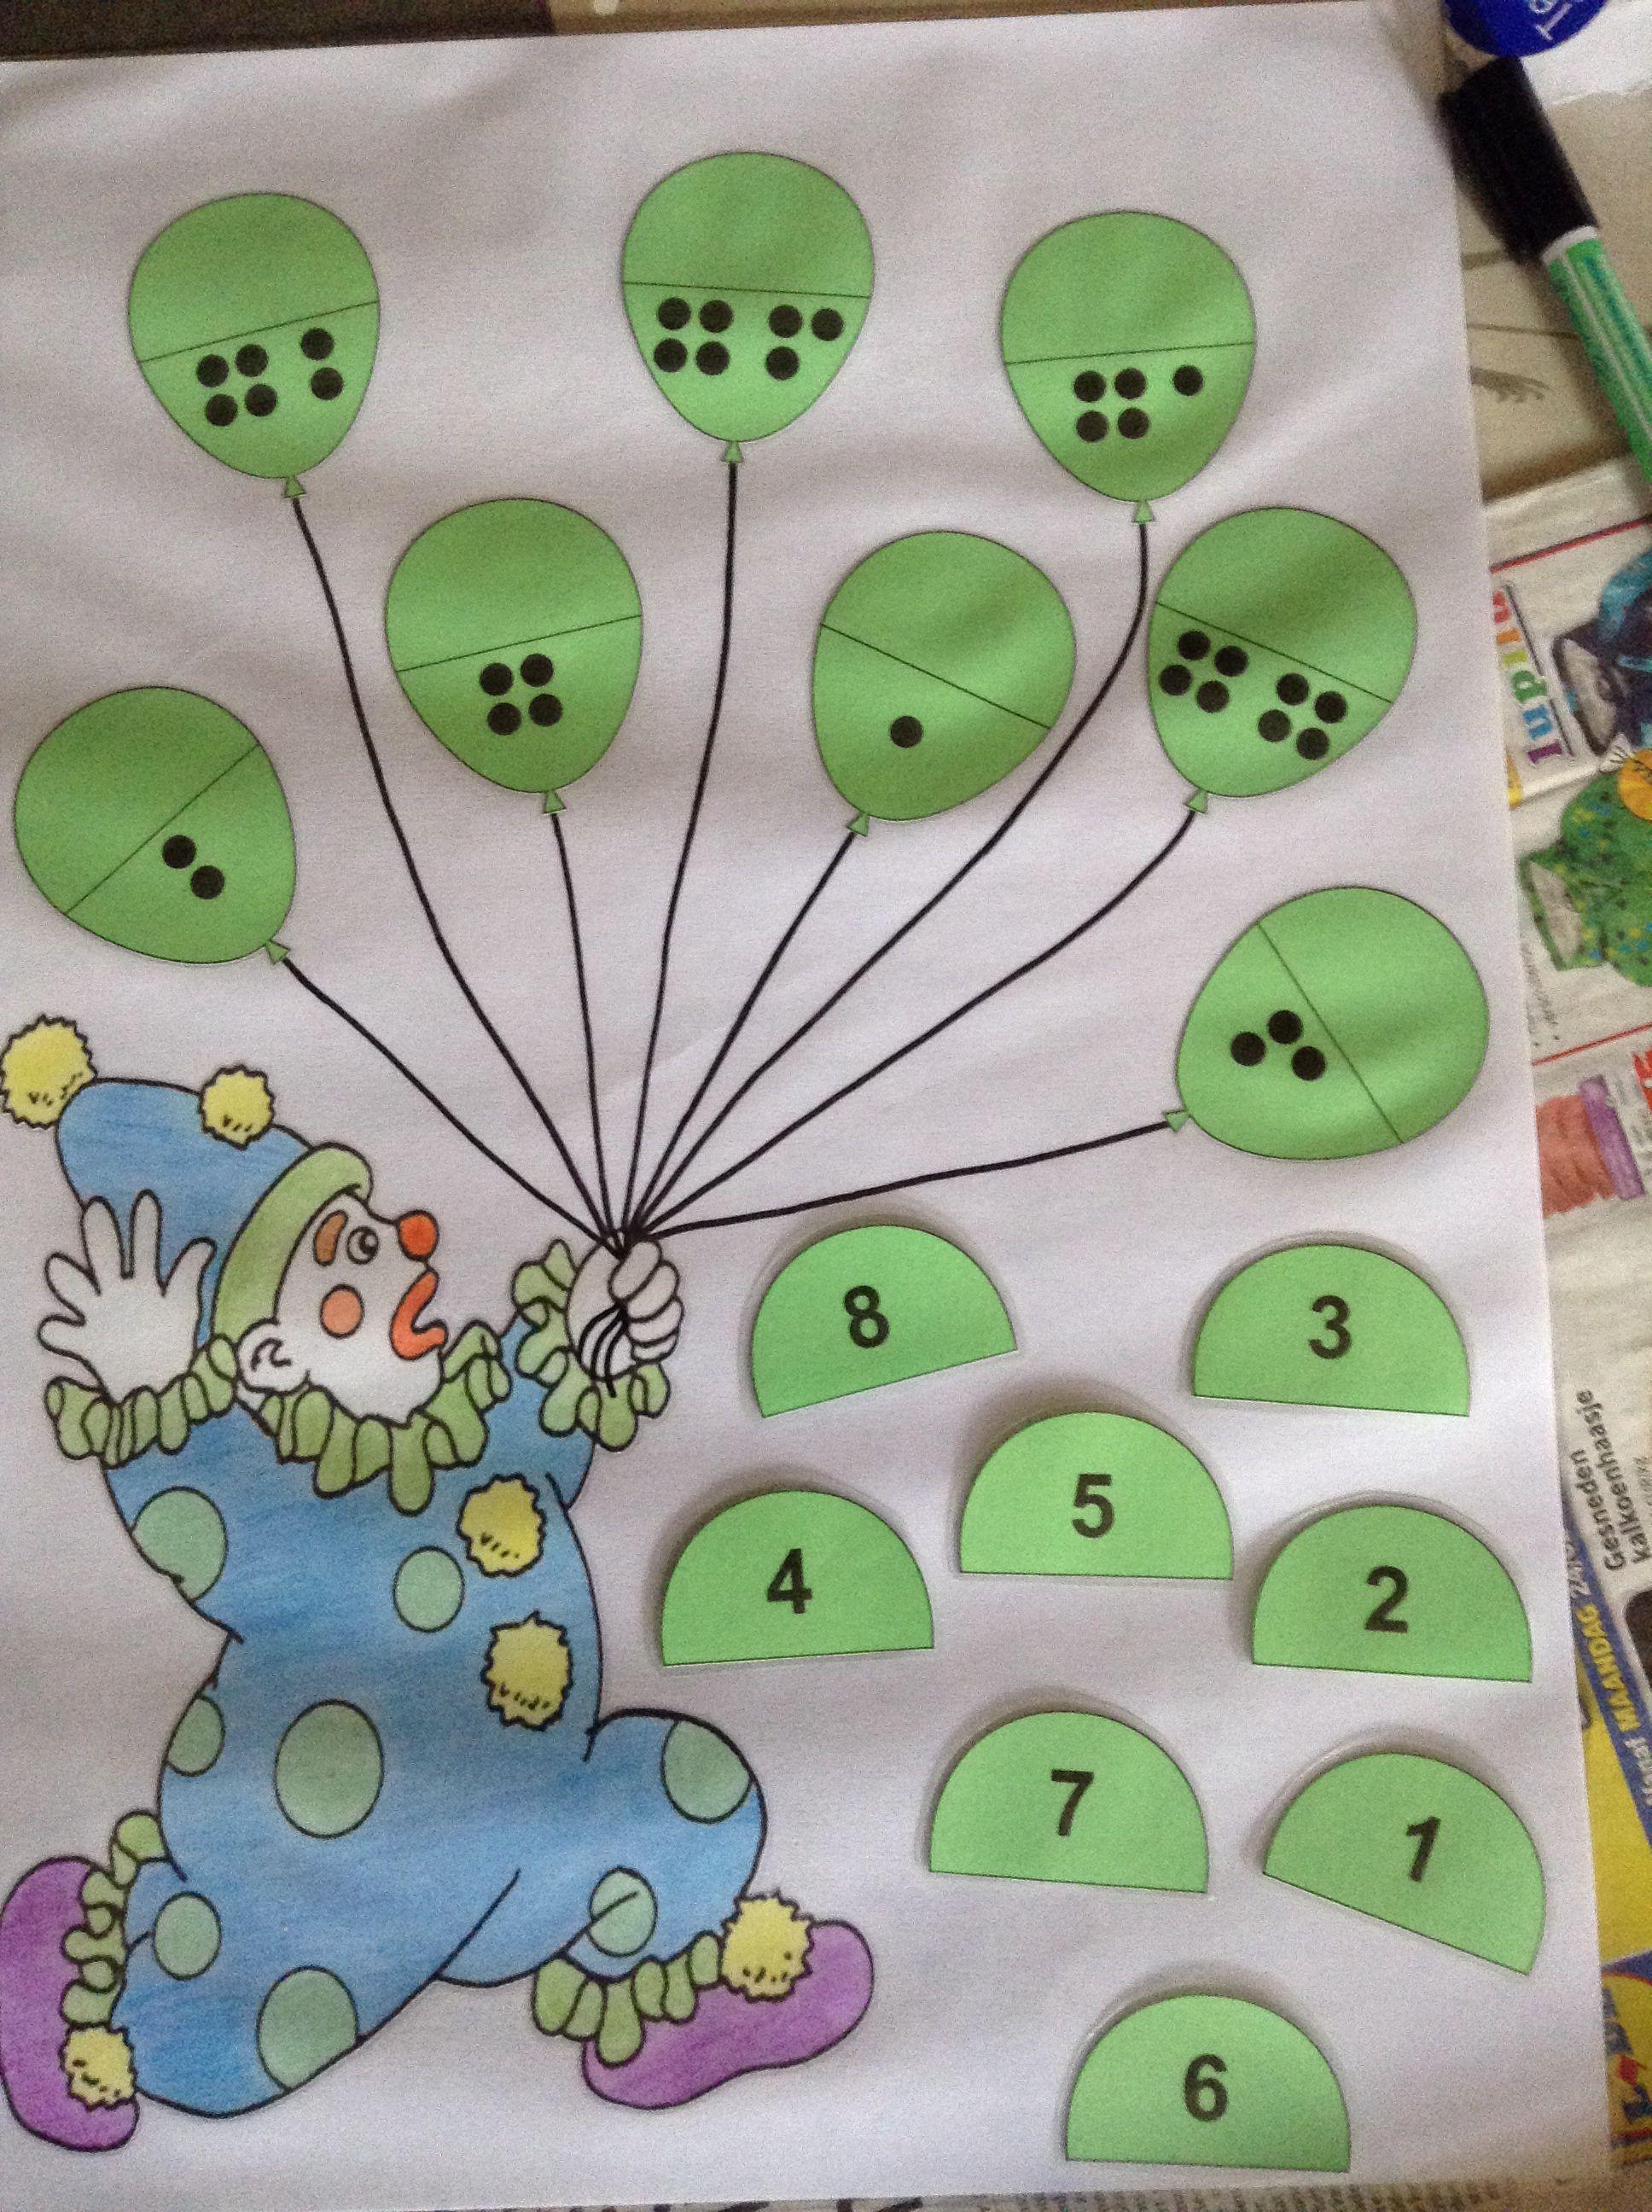 Zoek de juiste helft van de ballonnen | Circus | Pinterest | Math ...